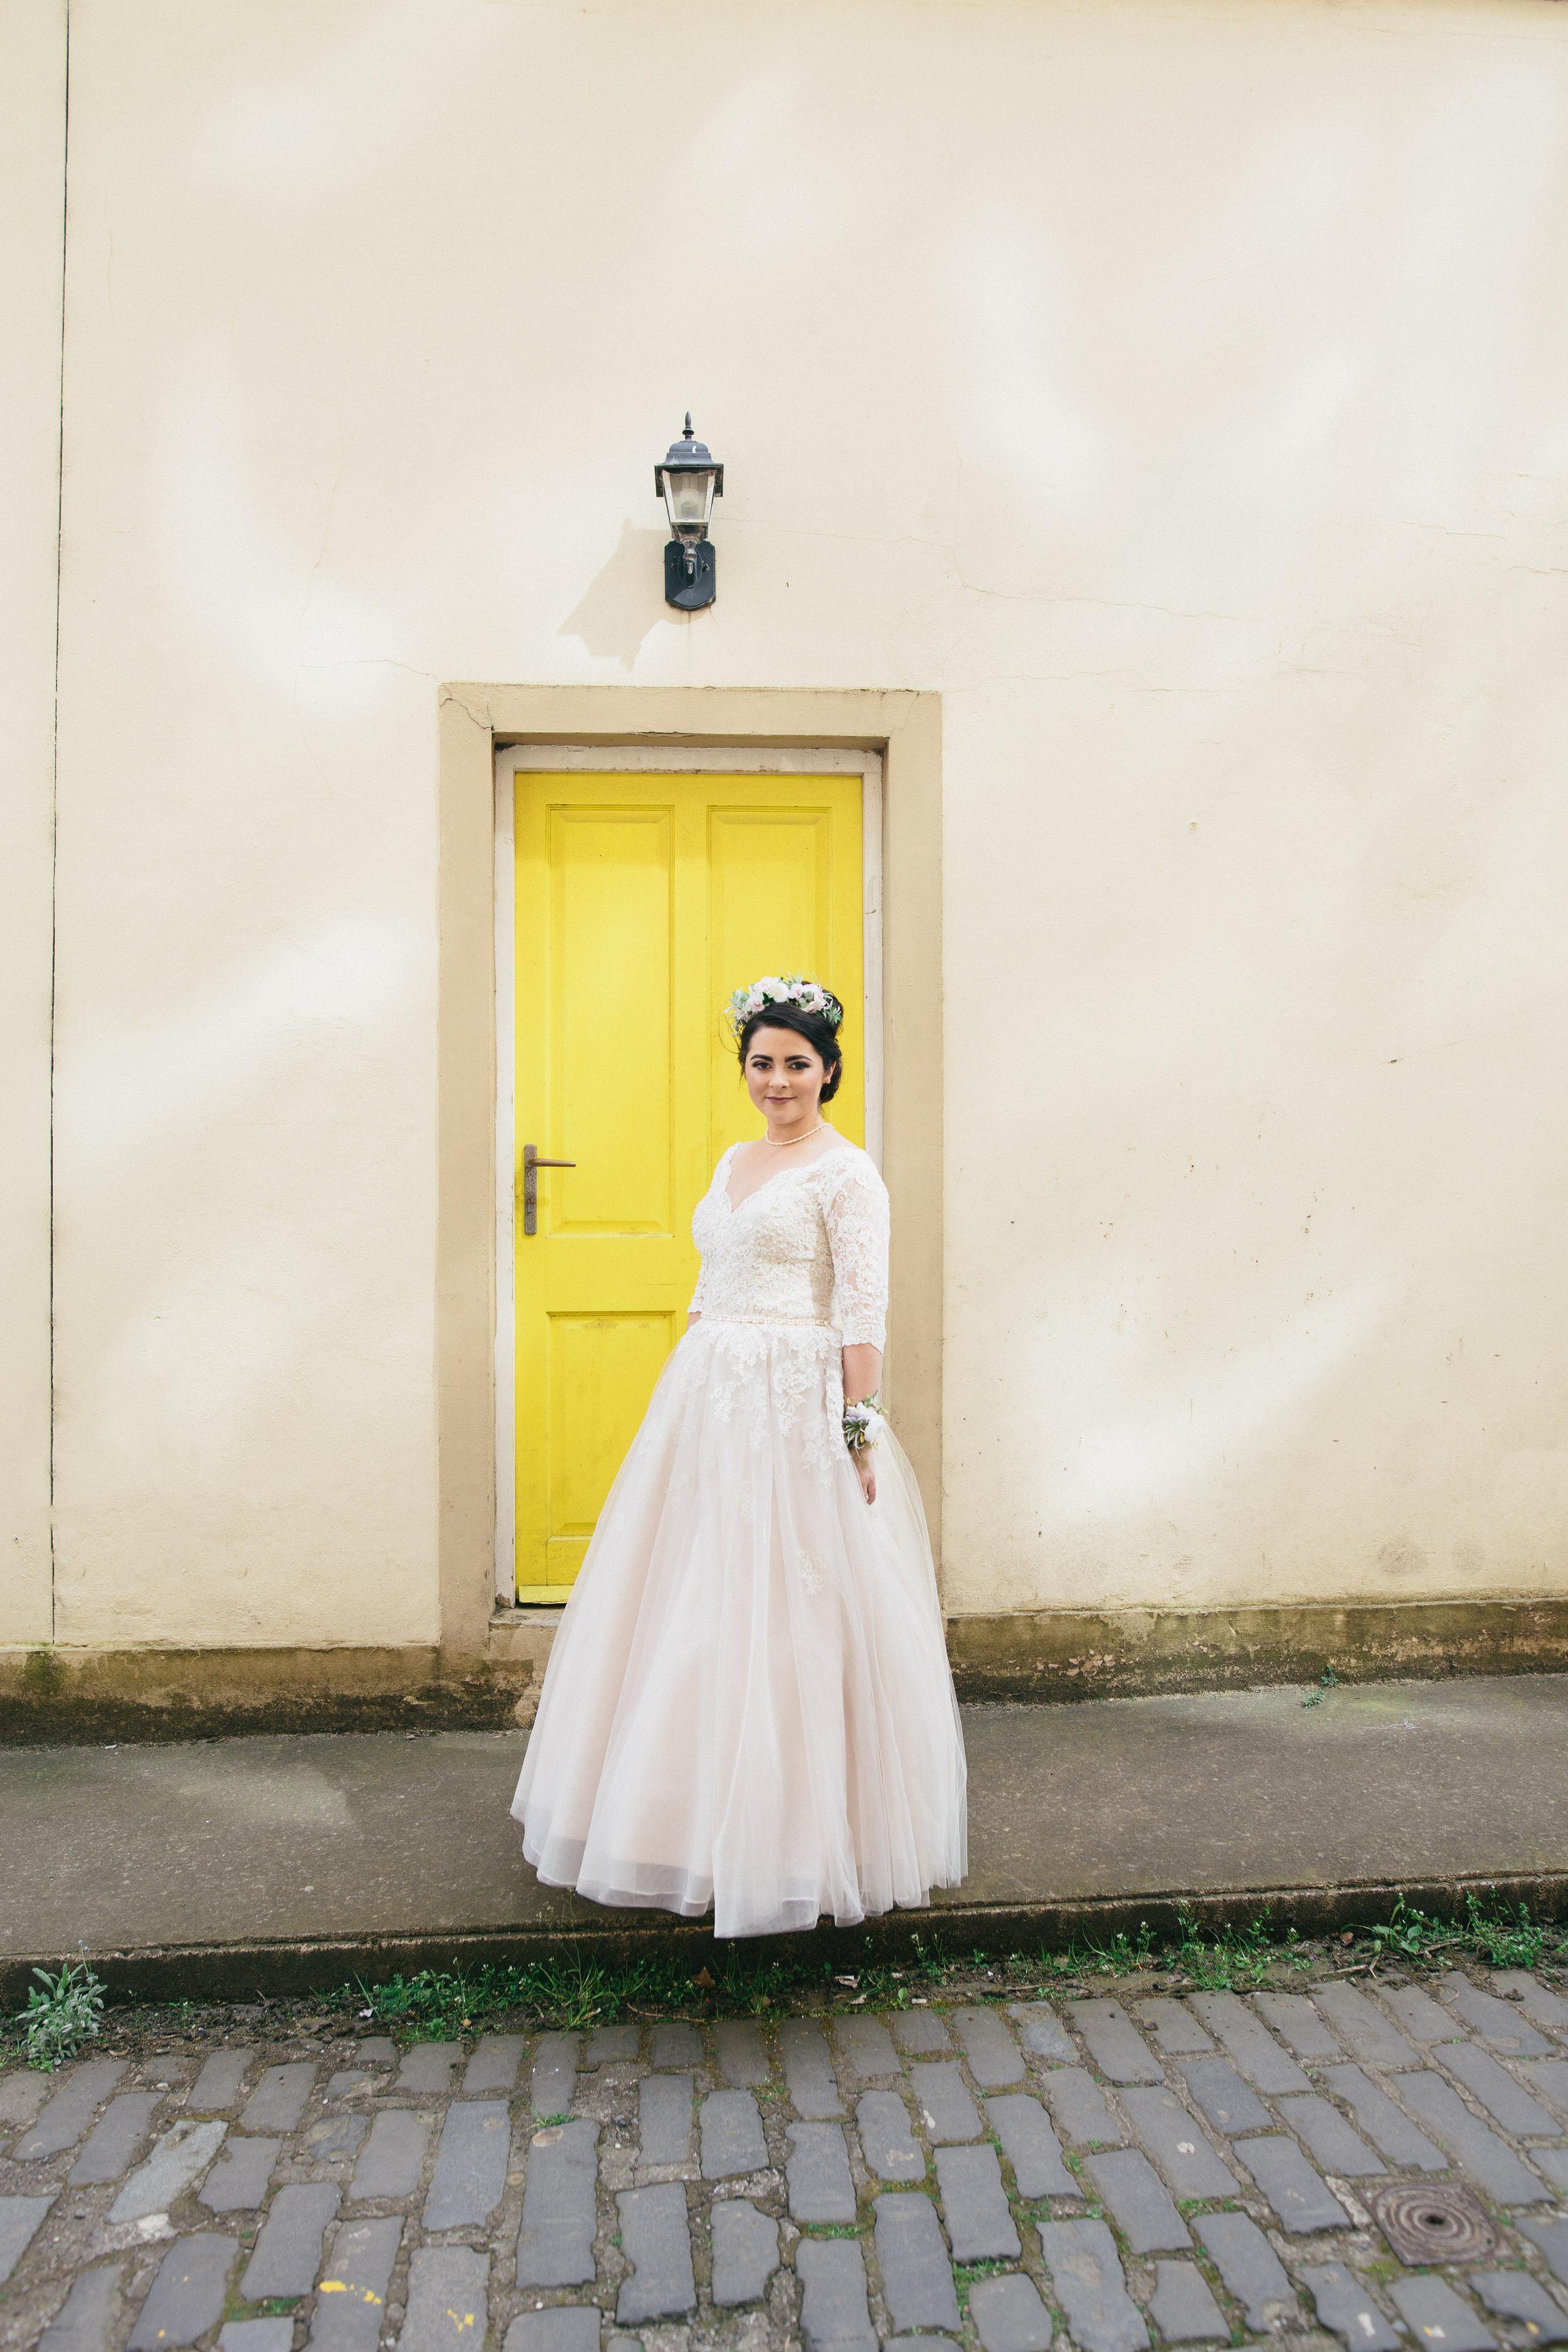 Quirky Wedding Photographer Scotland Glasgow Edinburgh Mirrorbox 158.jpg